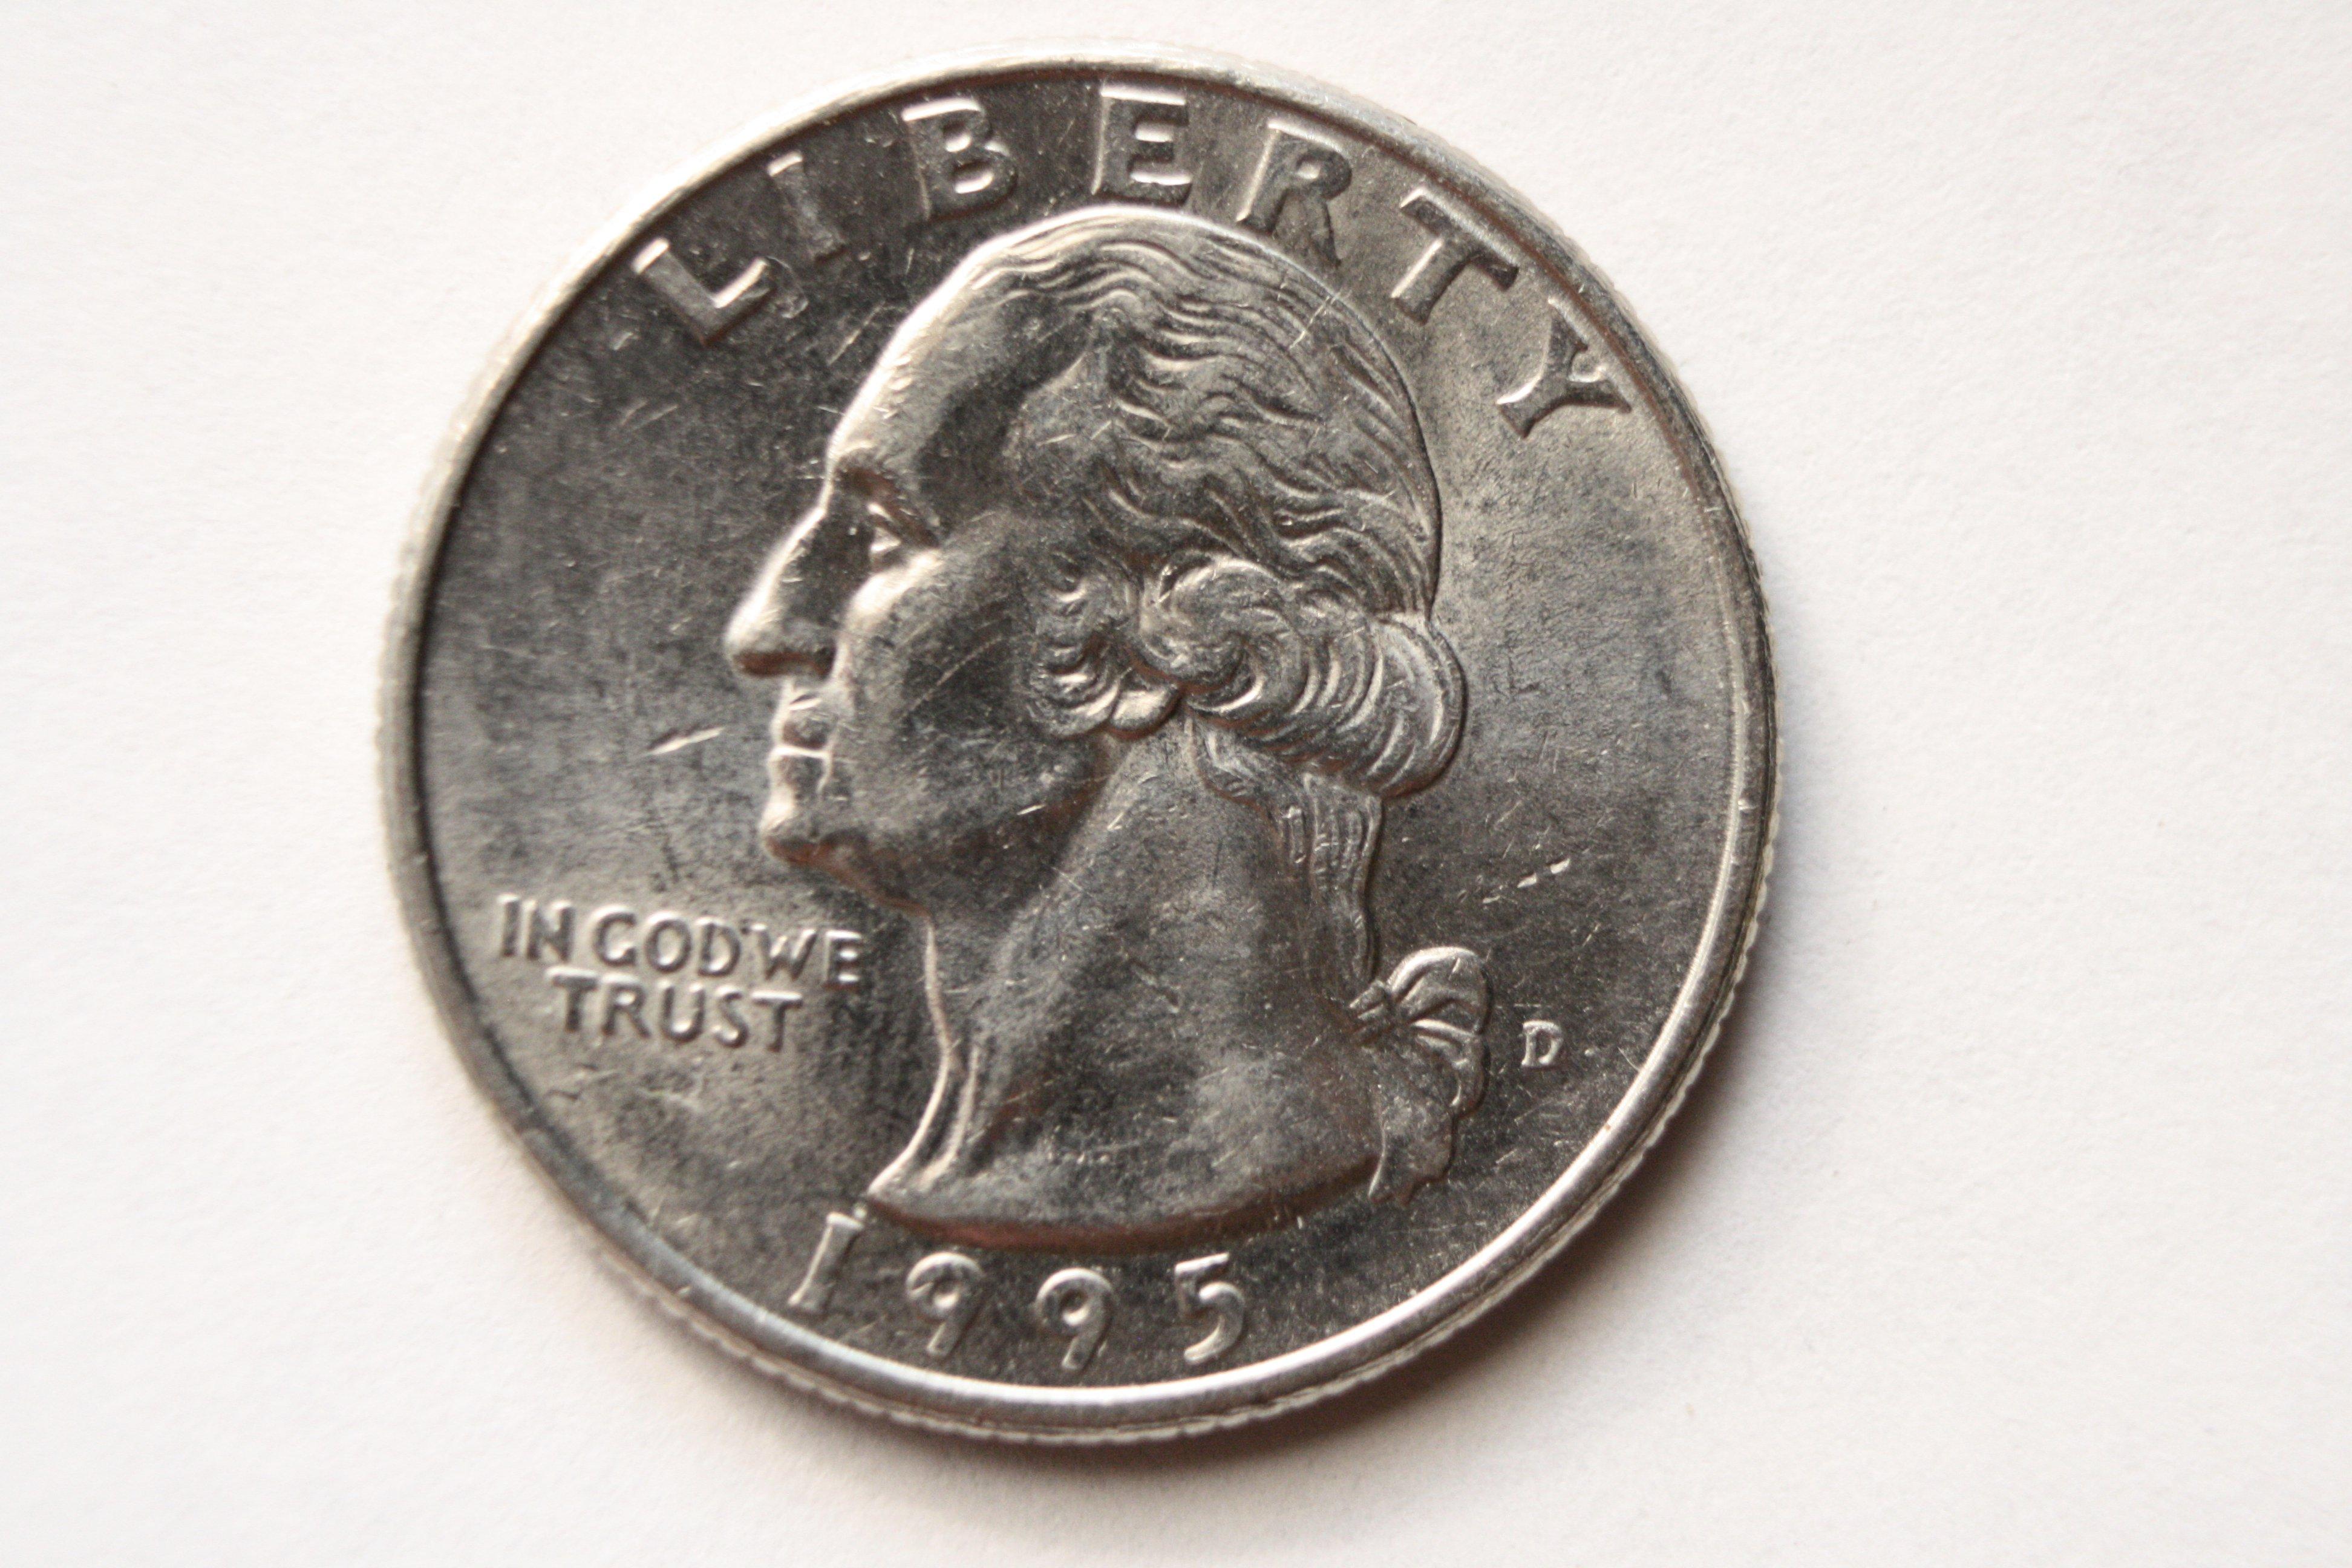 https://i1.wp.com/www.photos-public-domain.com/wp-content/uploads/2012/09/us-quarter-dollar-coin-front.jpg